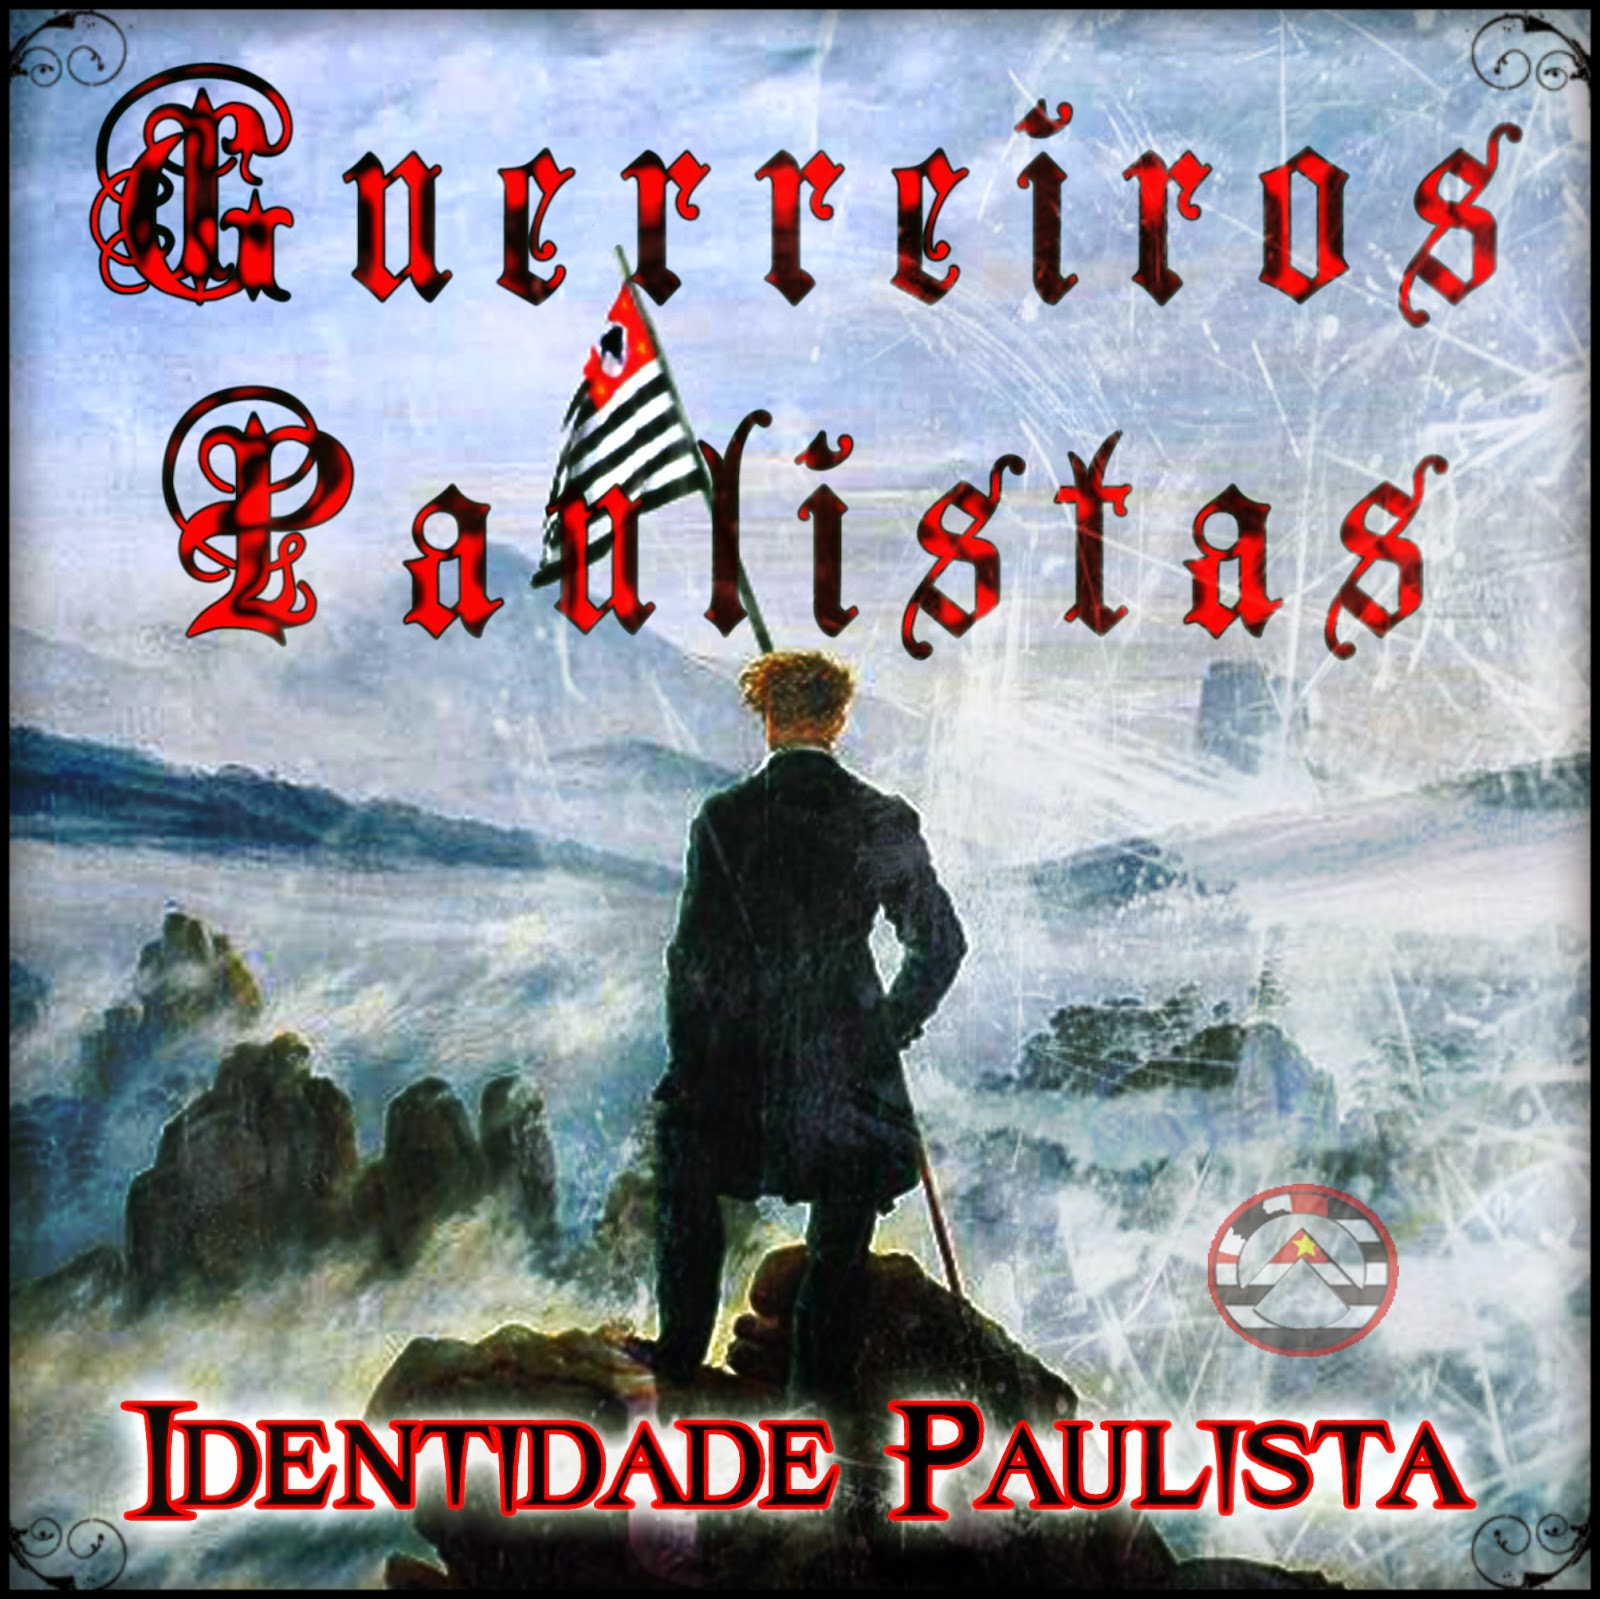 Paulista Identity Identidade Paulista Guerreiros Paulistas 1932